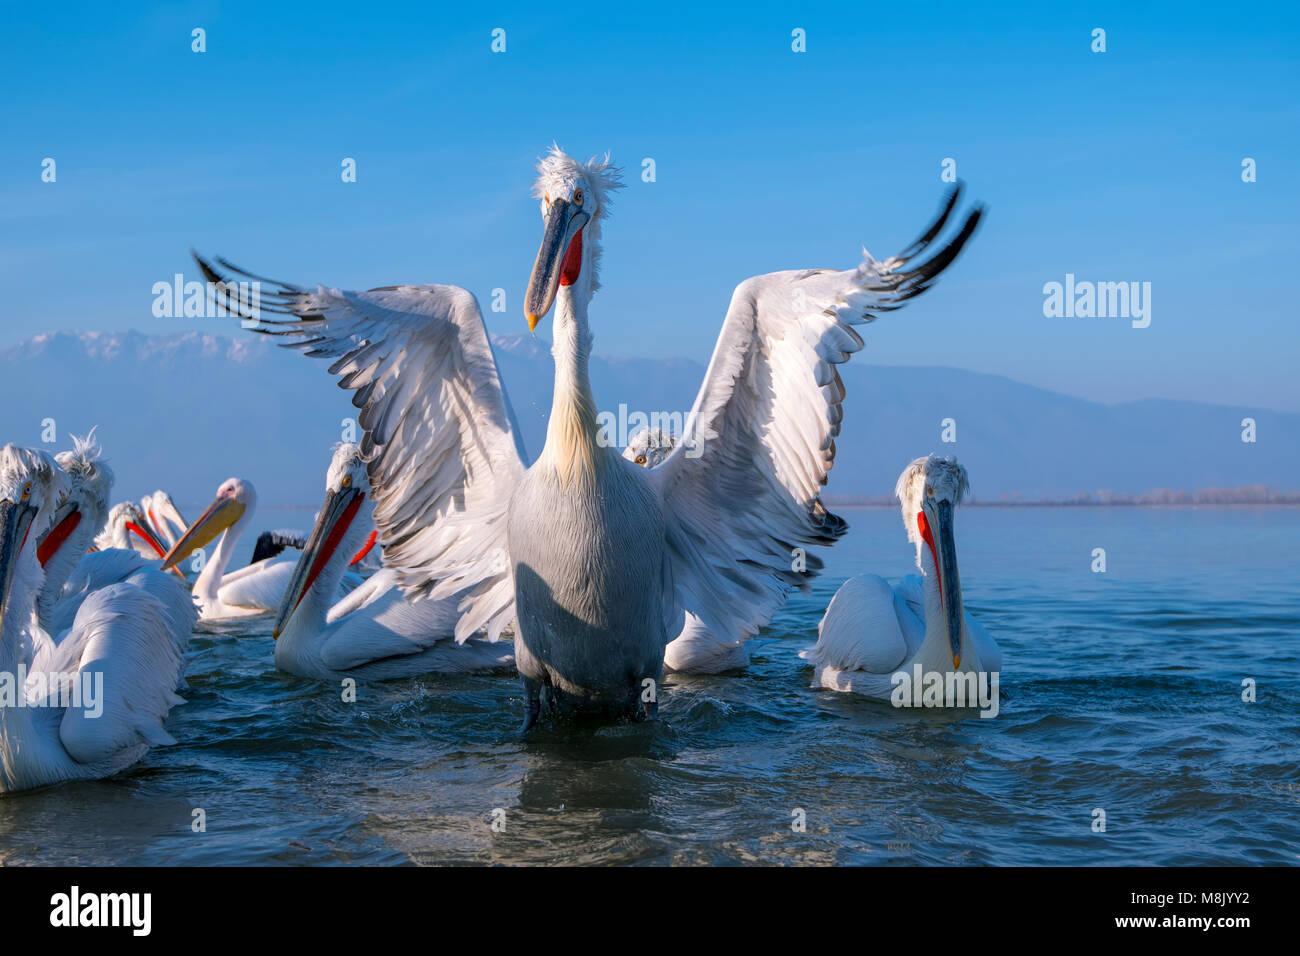 Dalmatian pelican, white big bird Stock Photo